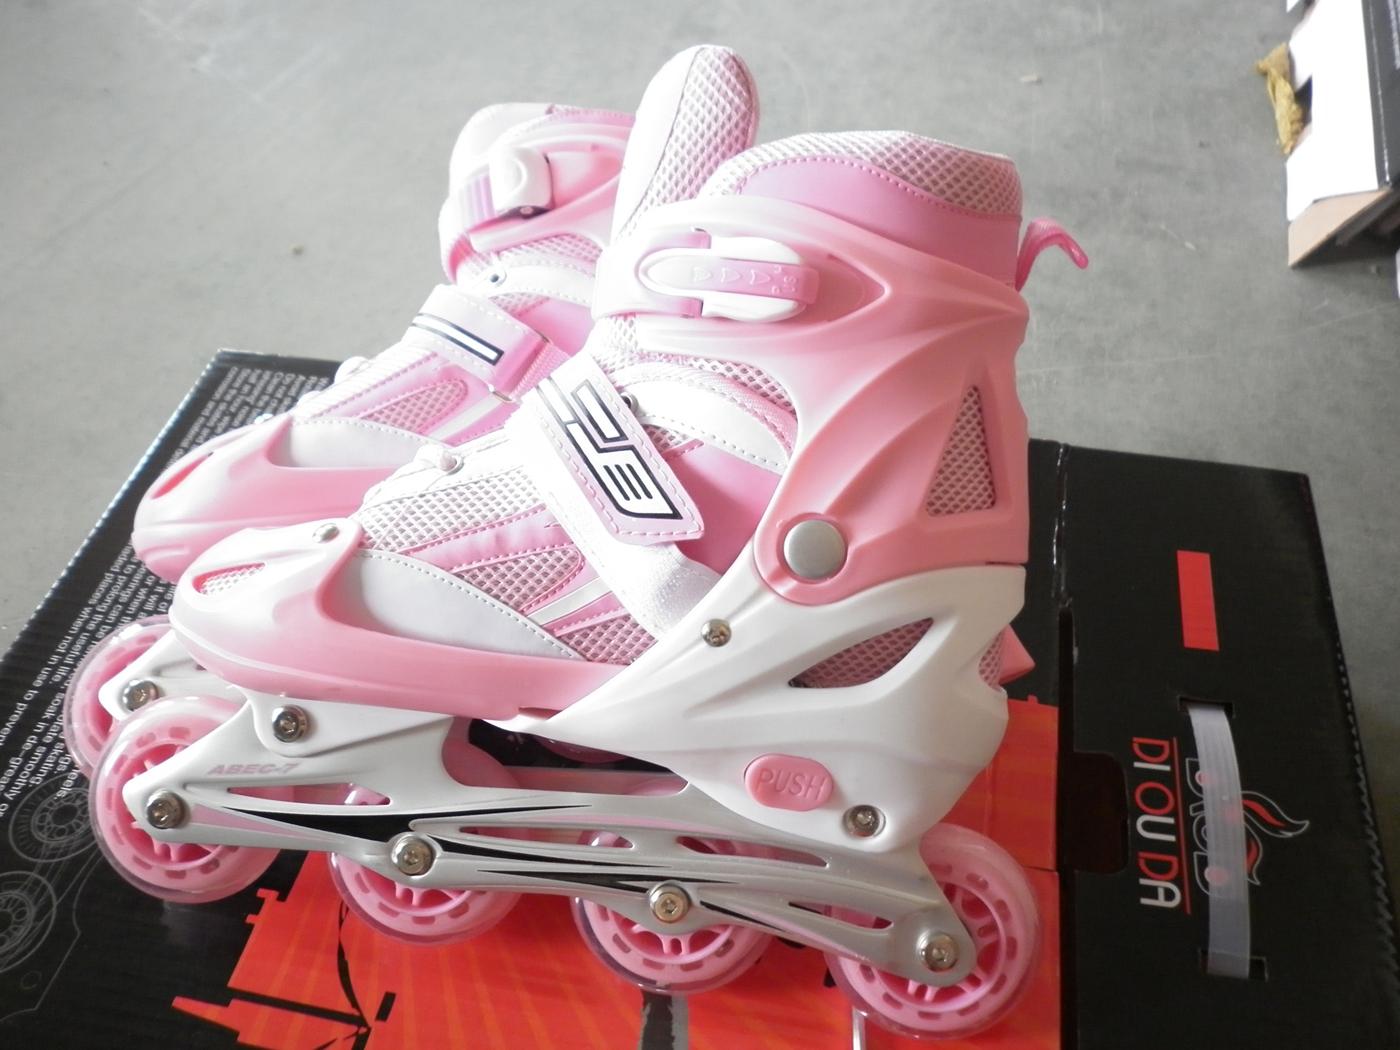 Grosir Sepatu Roda Inline Skate November 2012